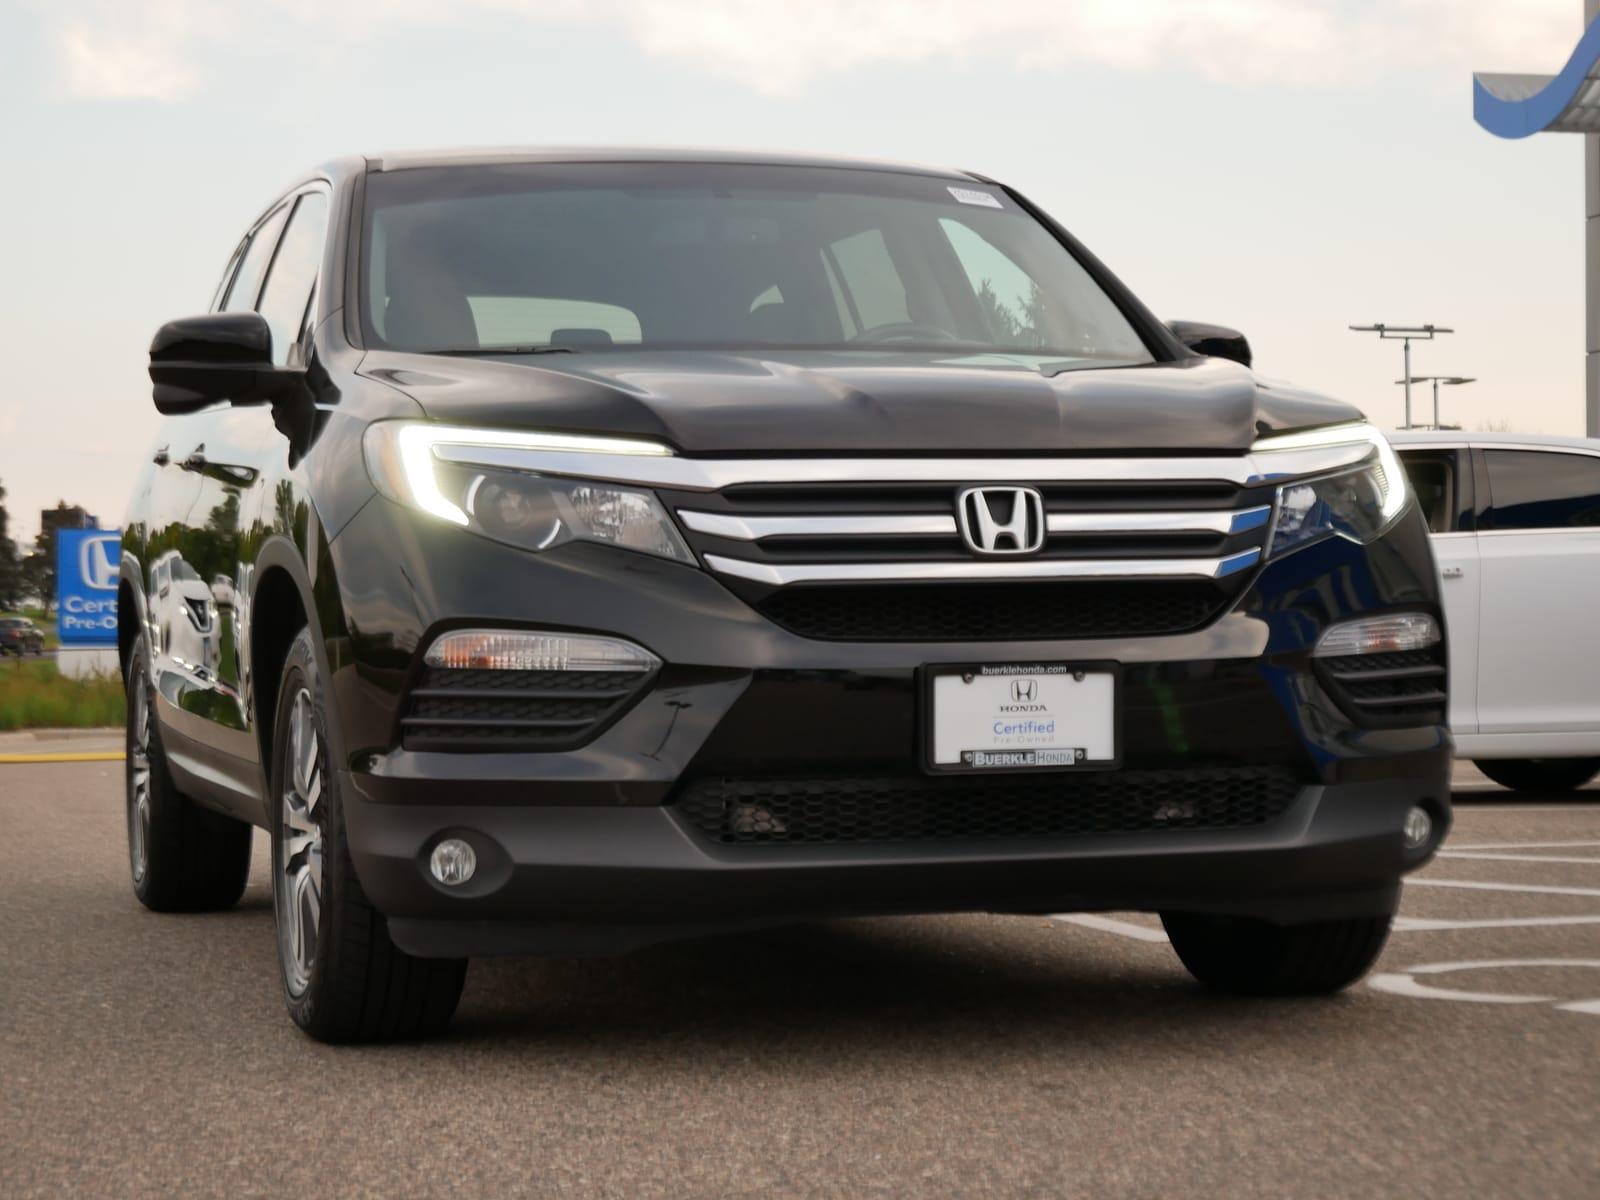 Certified 2018 Honda Pilot EX-L with VIN 5FNYF6H52JB068307 for sale in Saint Paul, Minnesota